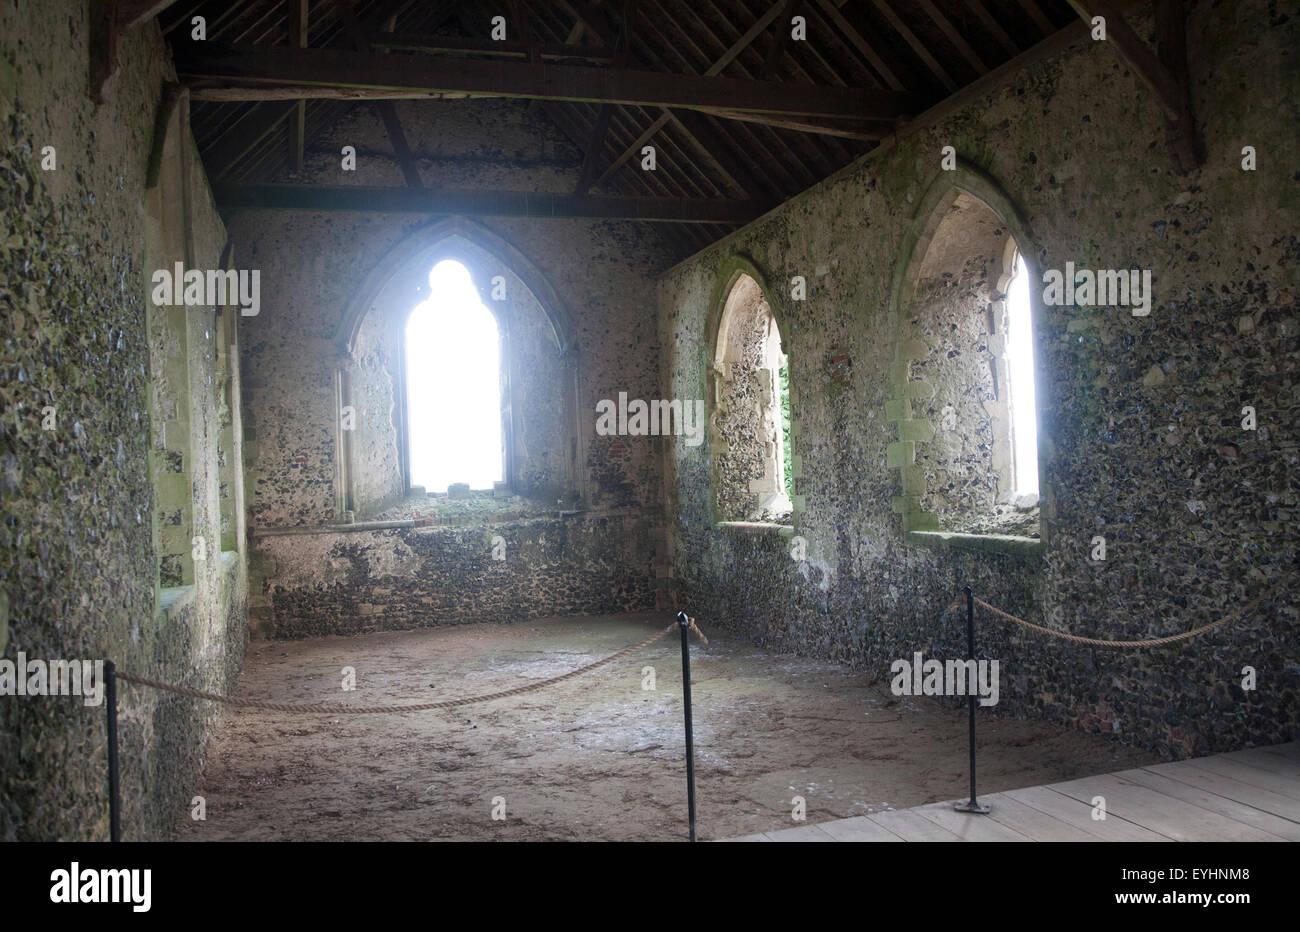 Inside the thirteenth century chapel Chisbury, Wiltshire, England, UK Stock Photo